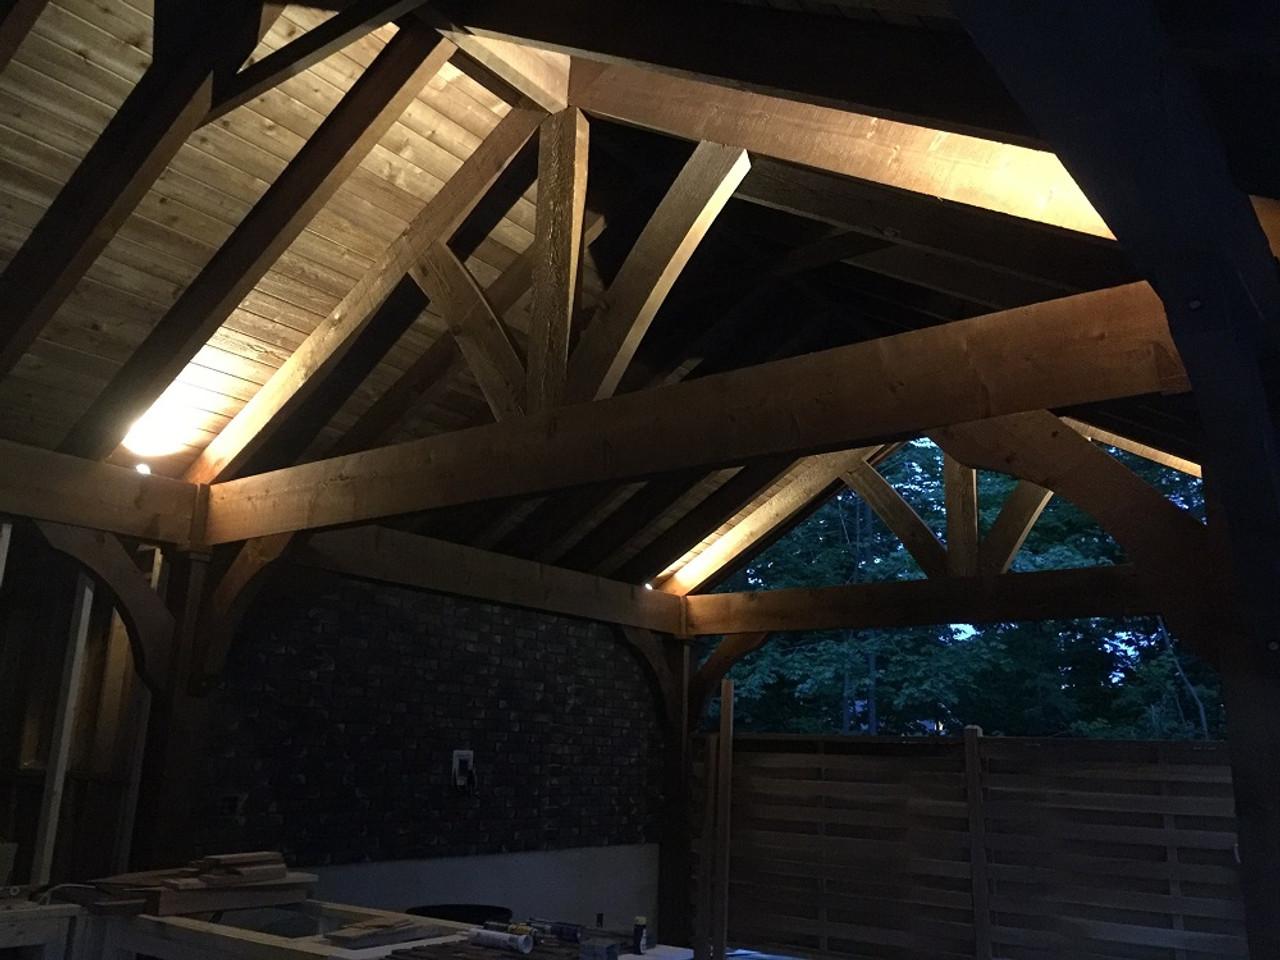 16x28 Grand Cedar Pavilion Kit Nighttime idea, Gliford, NH